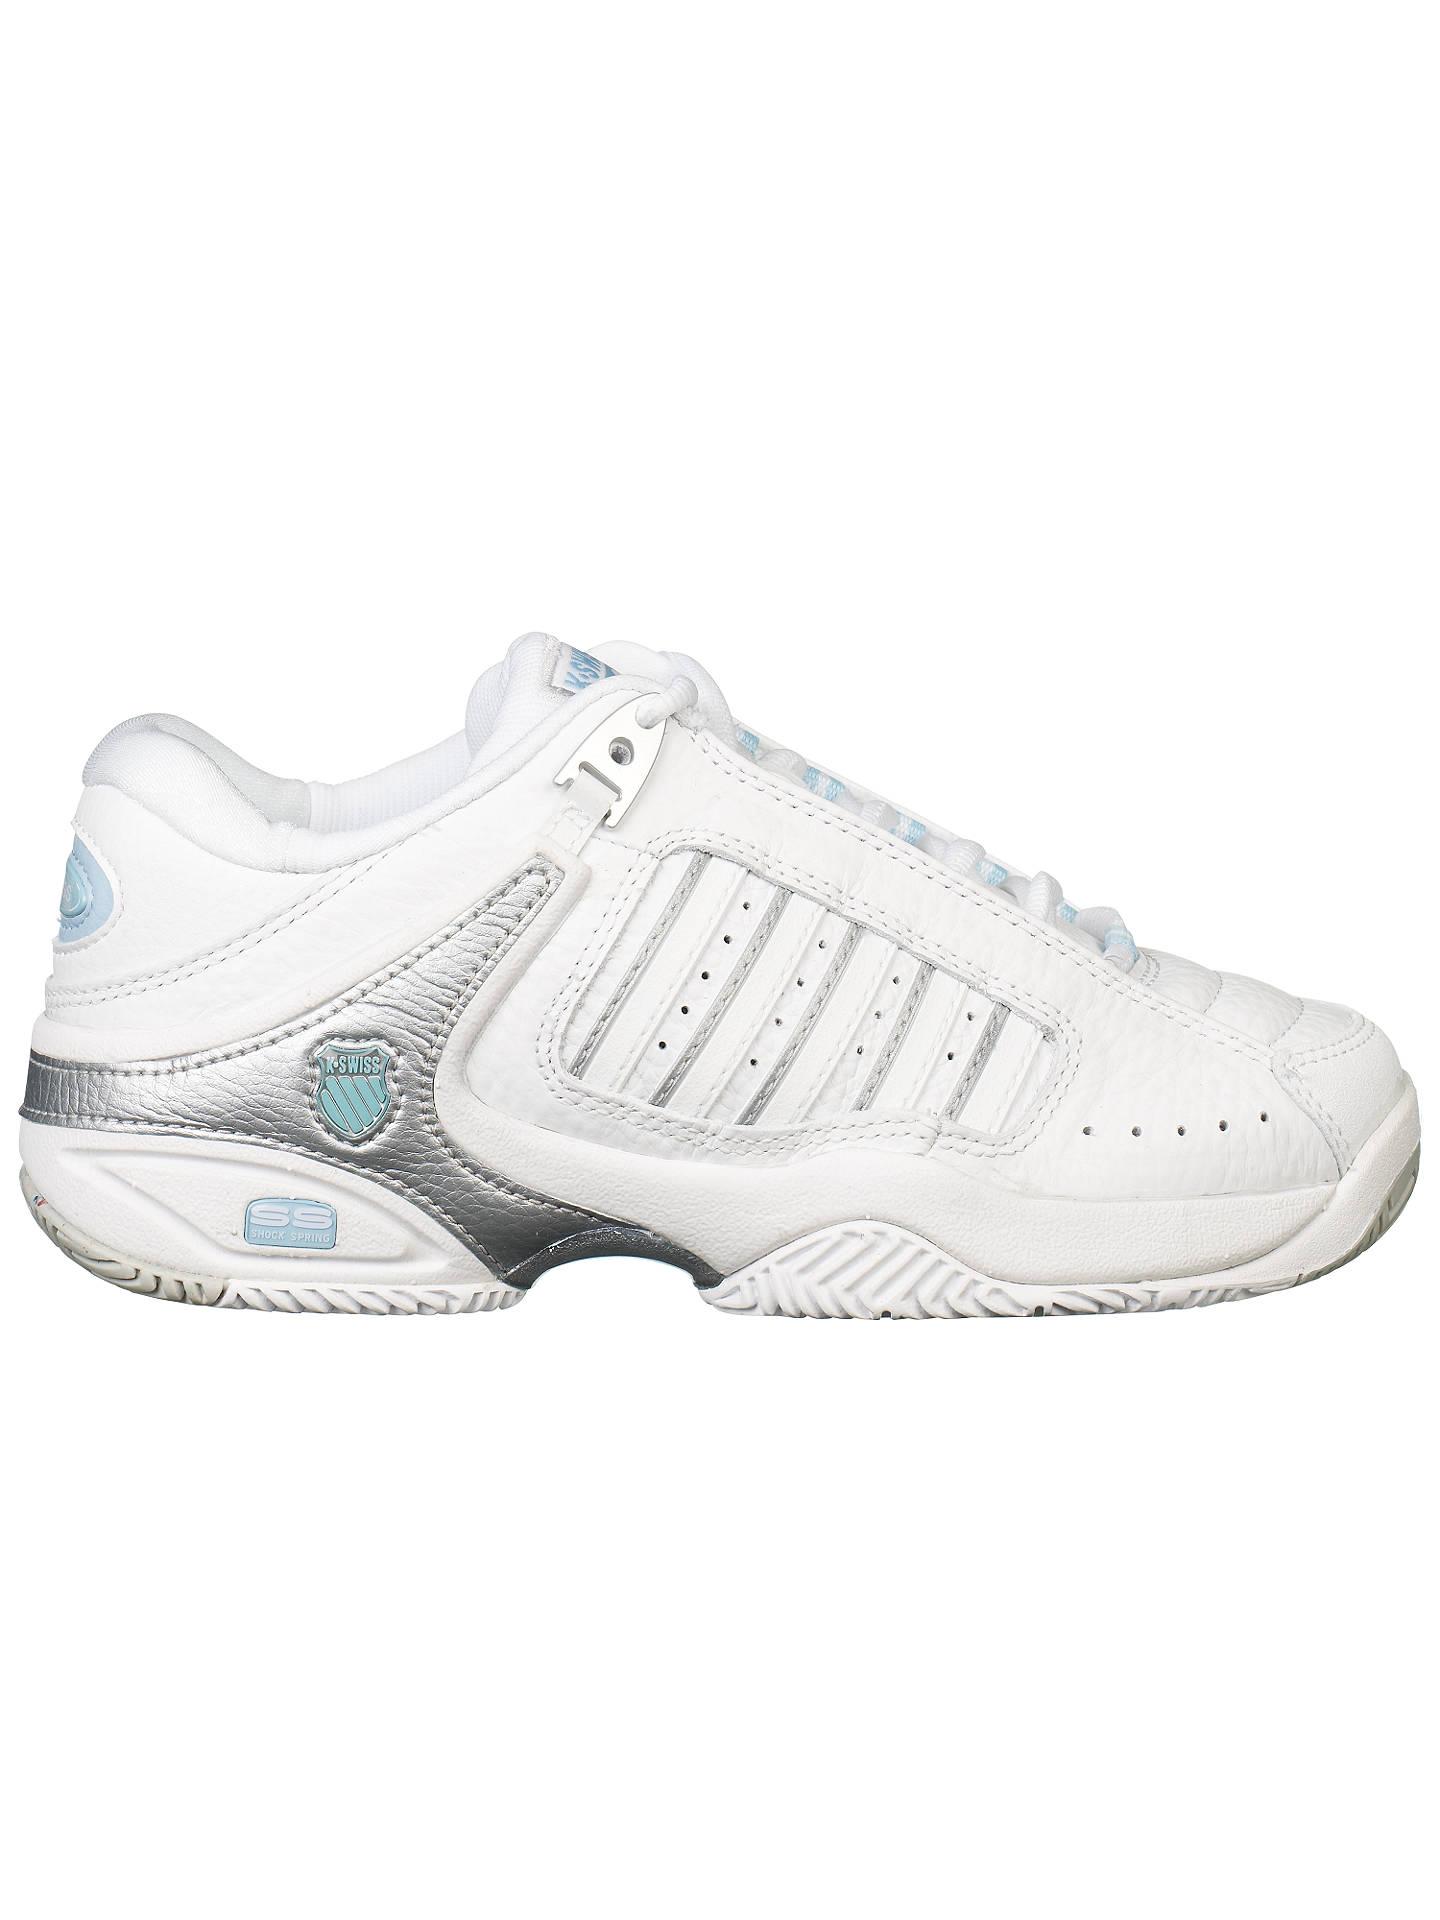 25f3a5f39c5e0 K-Swiss Women's Defier RS Tennis Shoes at John Lewis & Partners